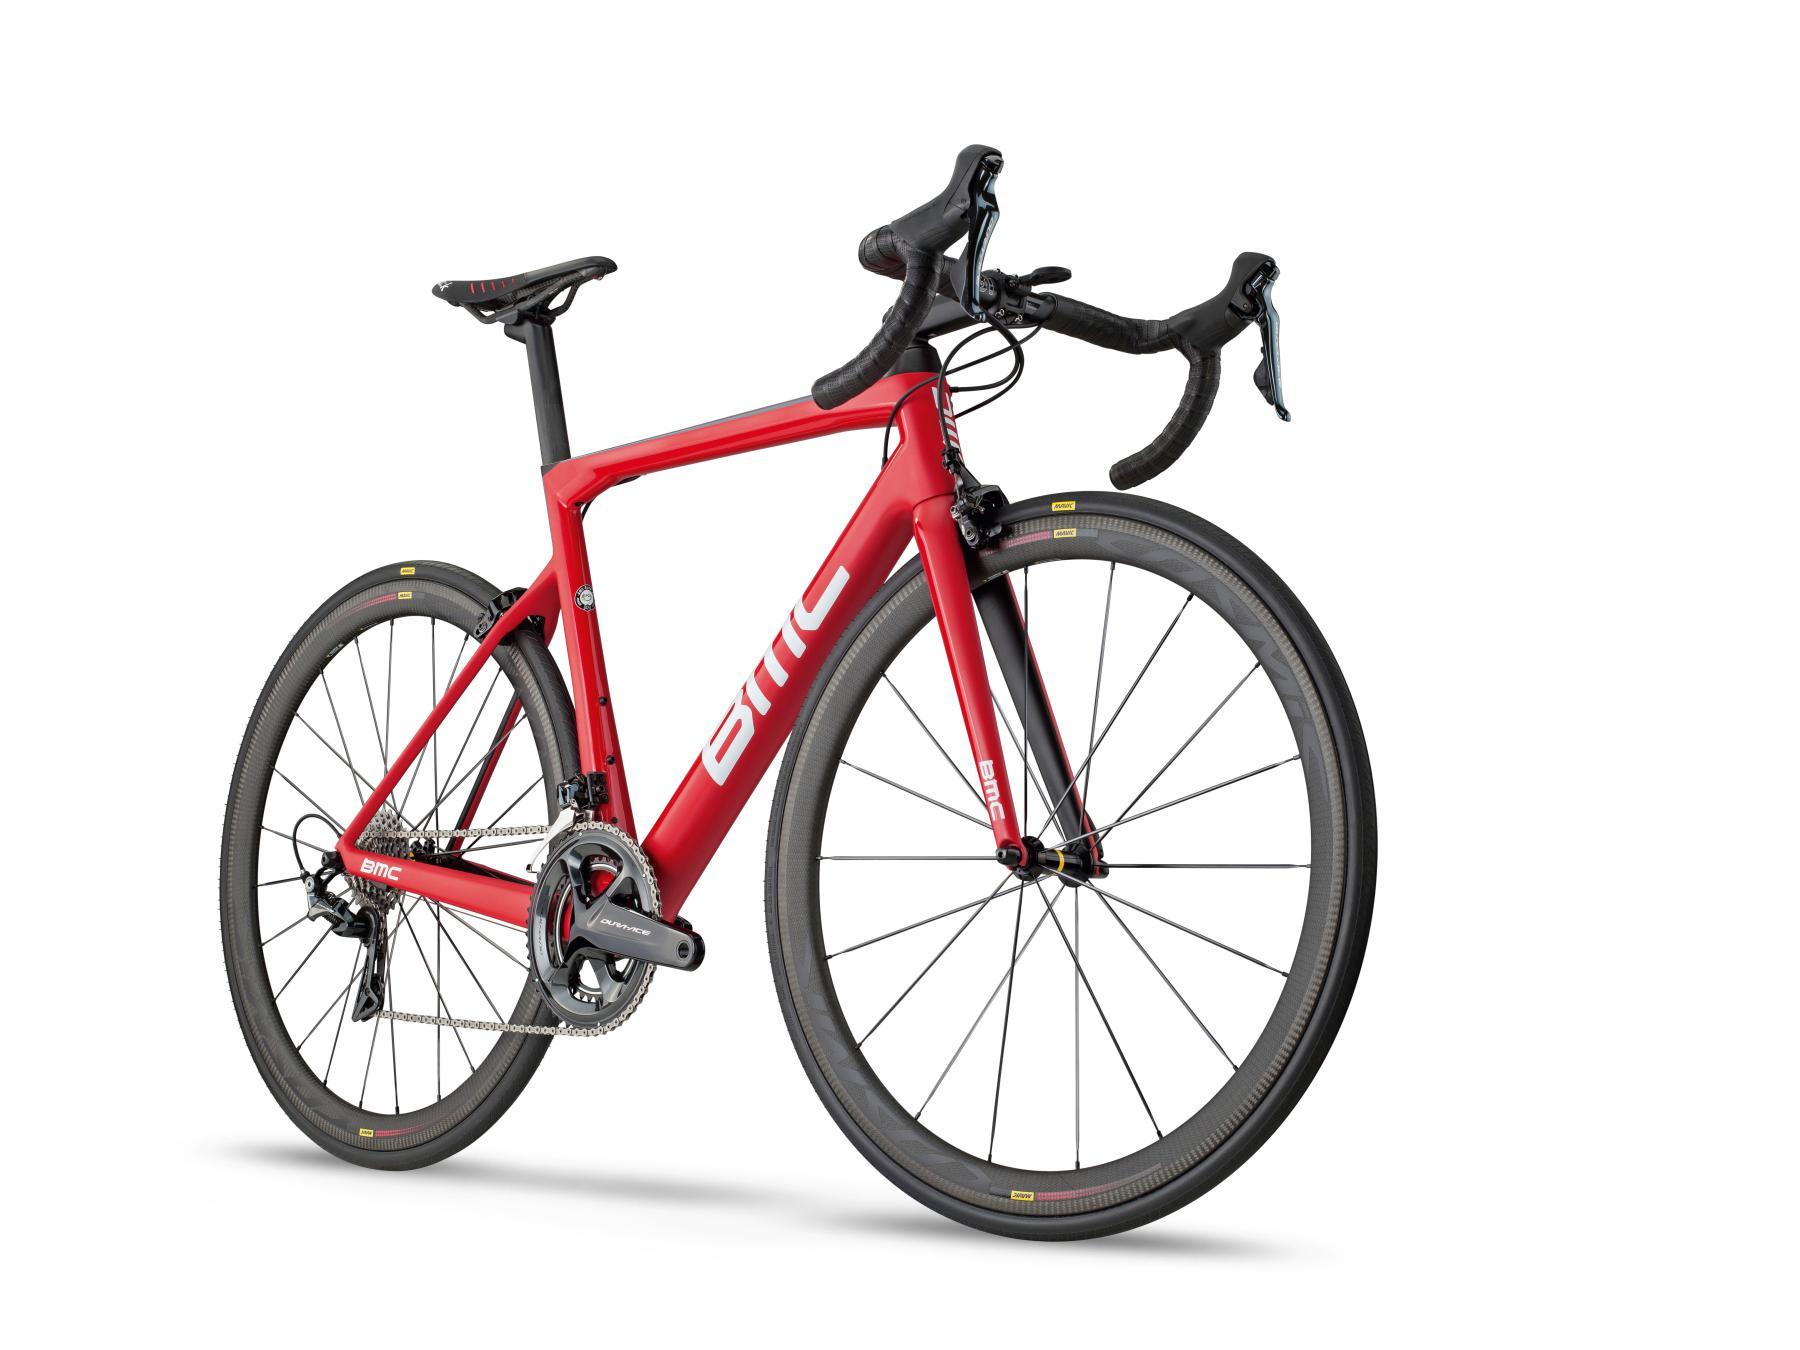 Nuova BMC Teammachine SLR 2018